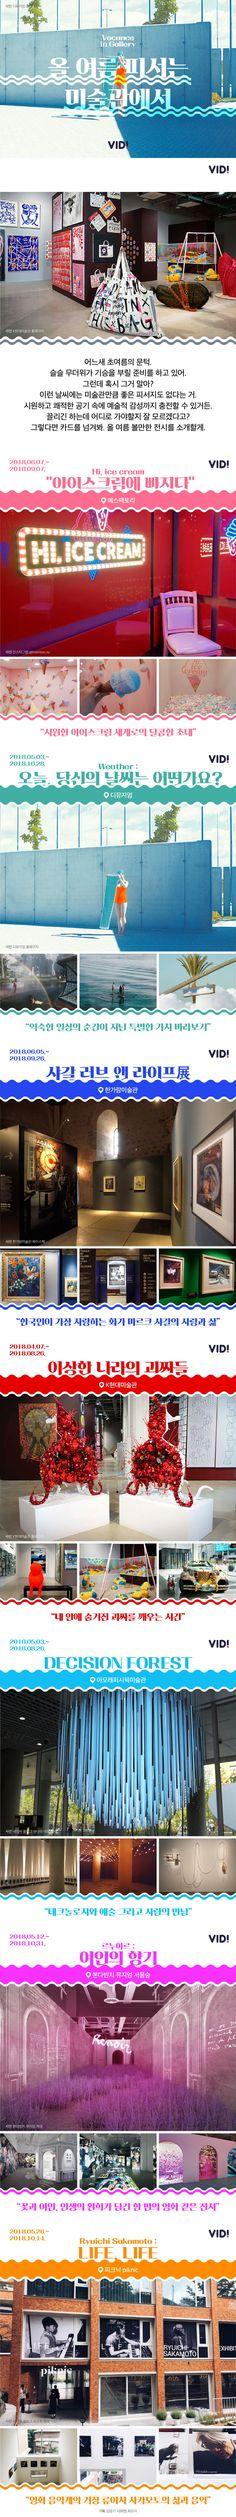 """Vacance in Gallery"" 올 여름 피서는 미술관에서 [카드뉴스] #culture #cardnews"